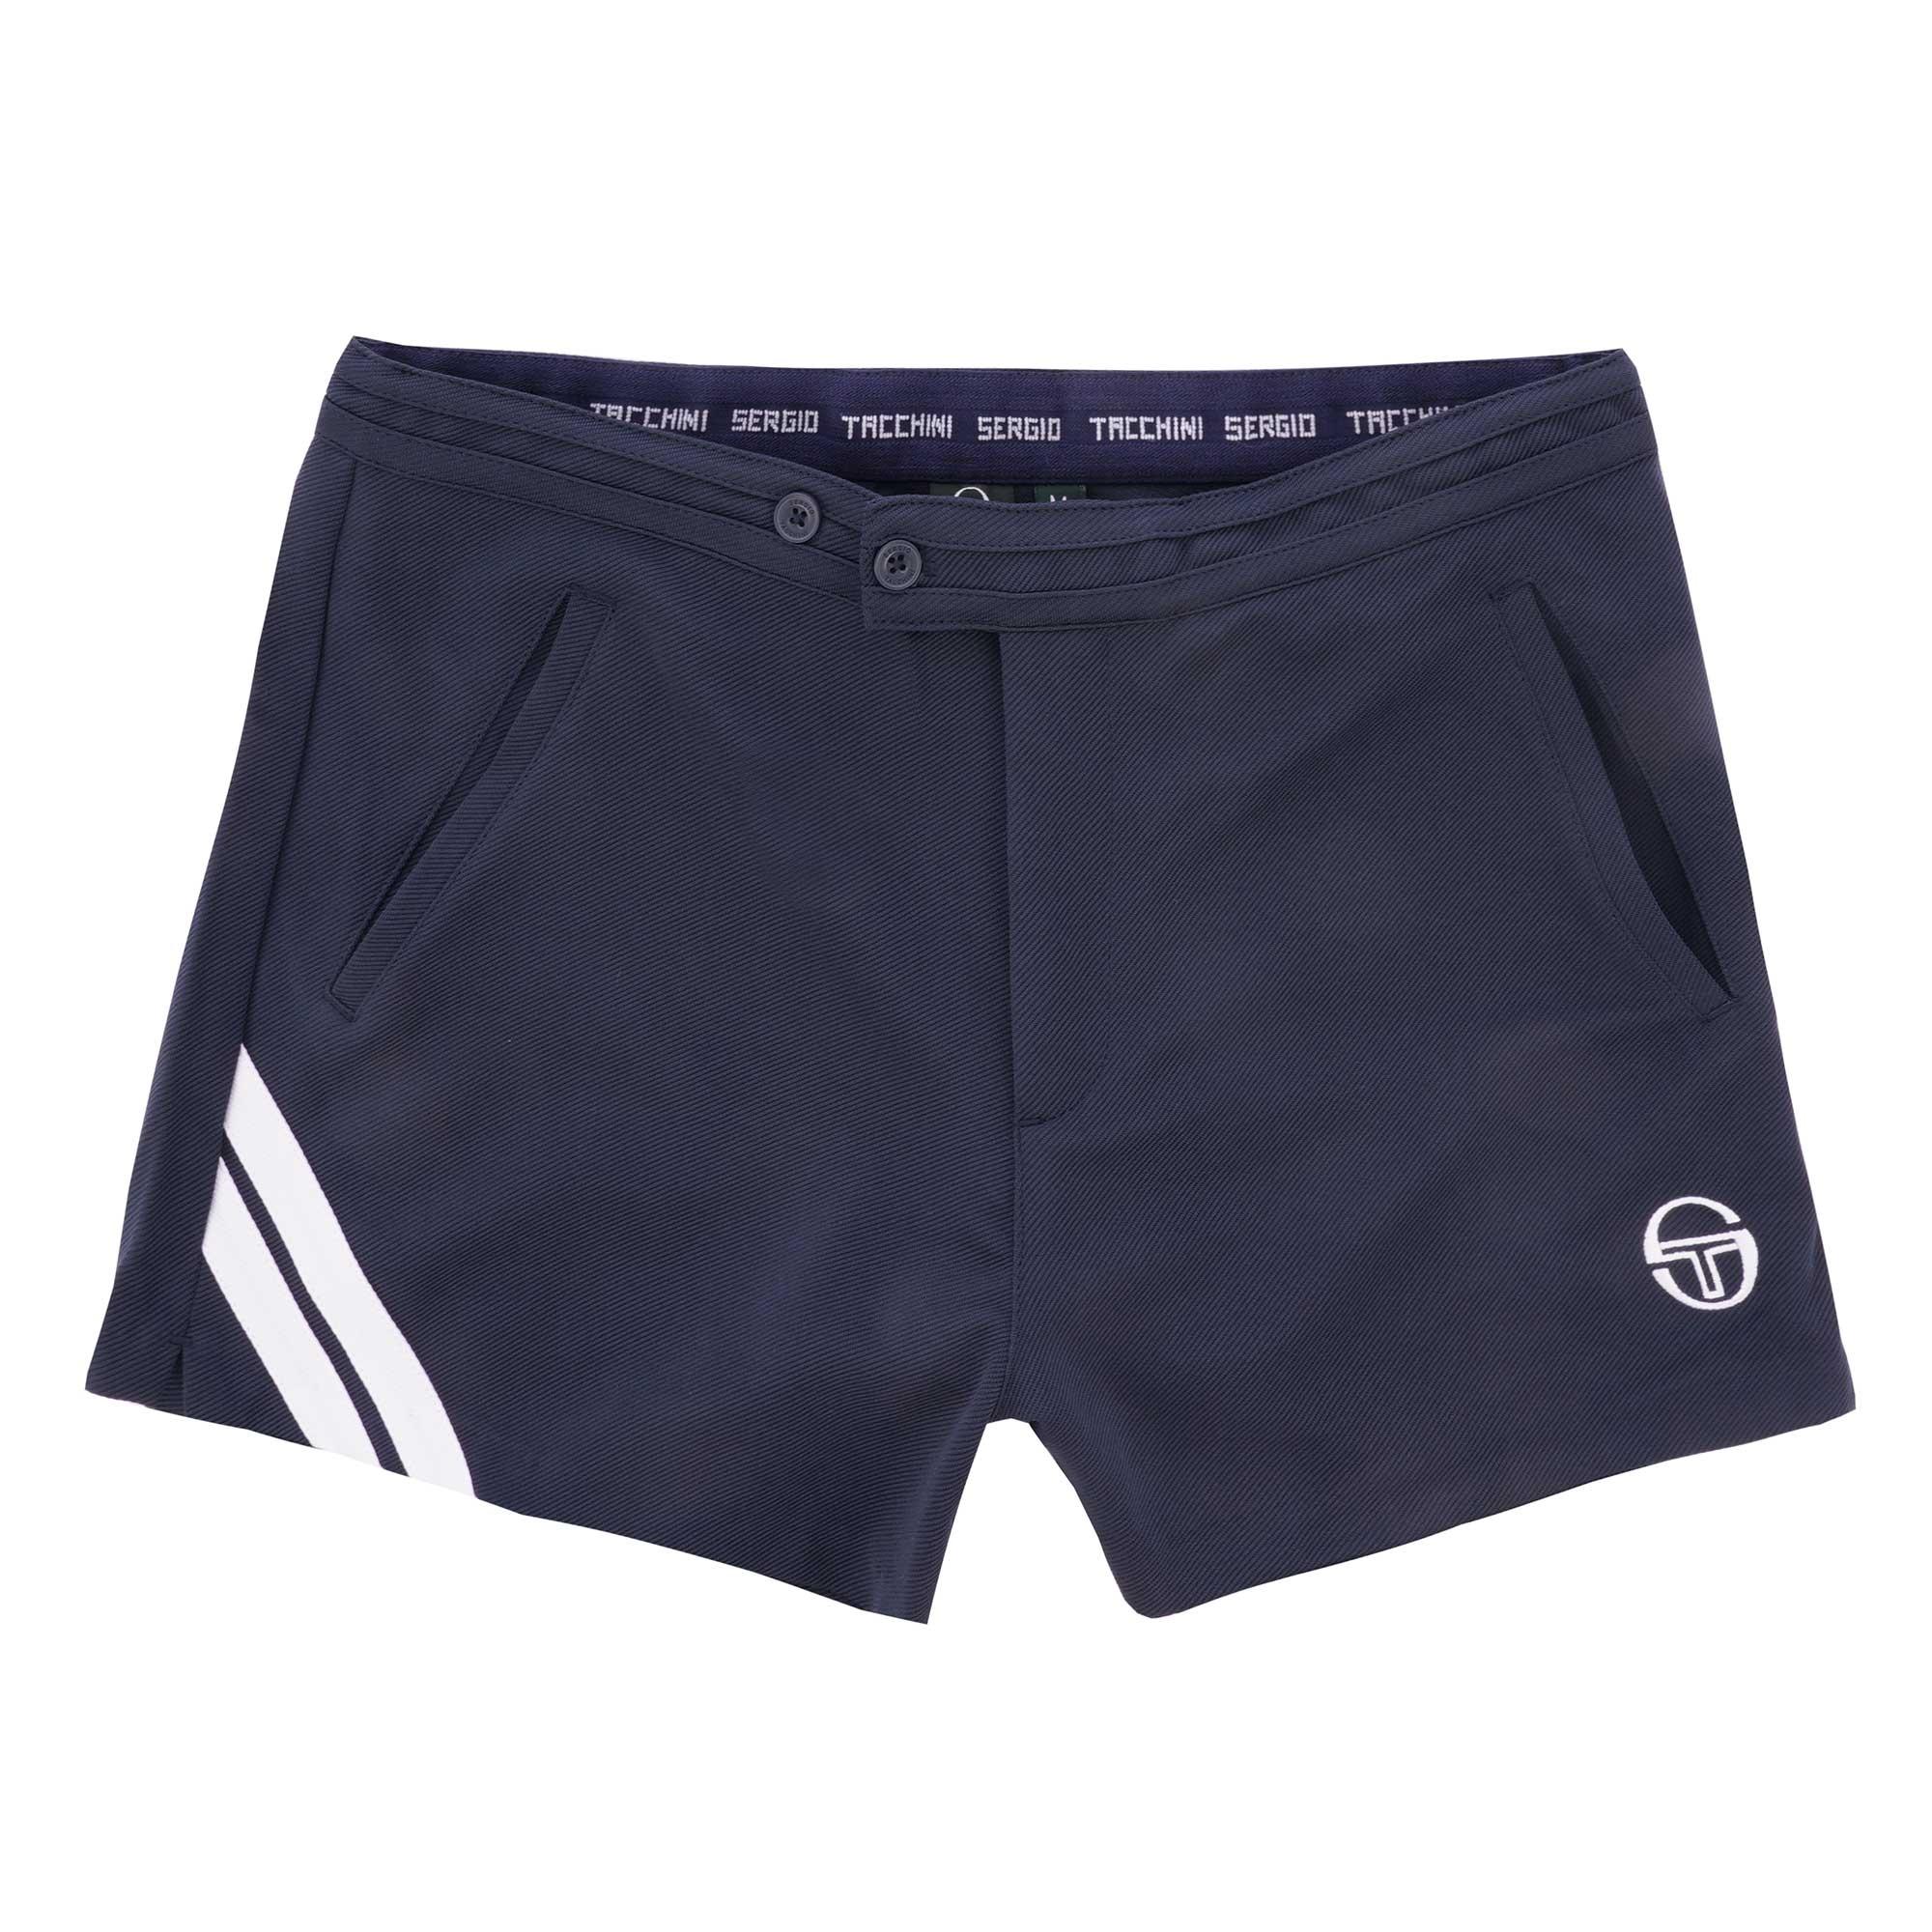 7a2b688dd6d4f Sergio Tacchini Time Shorts | Navy | 37572